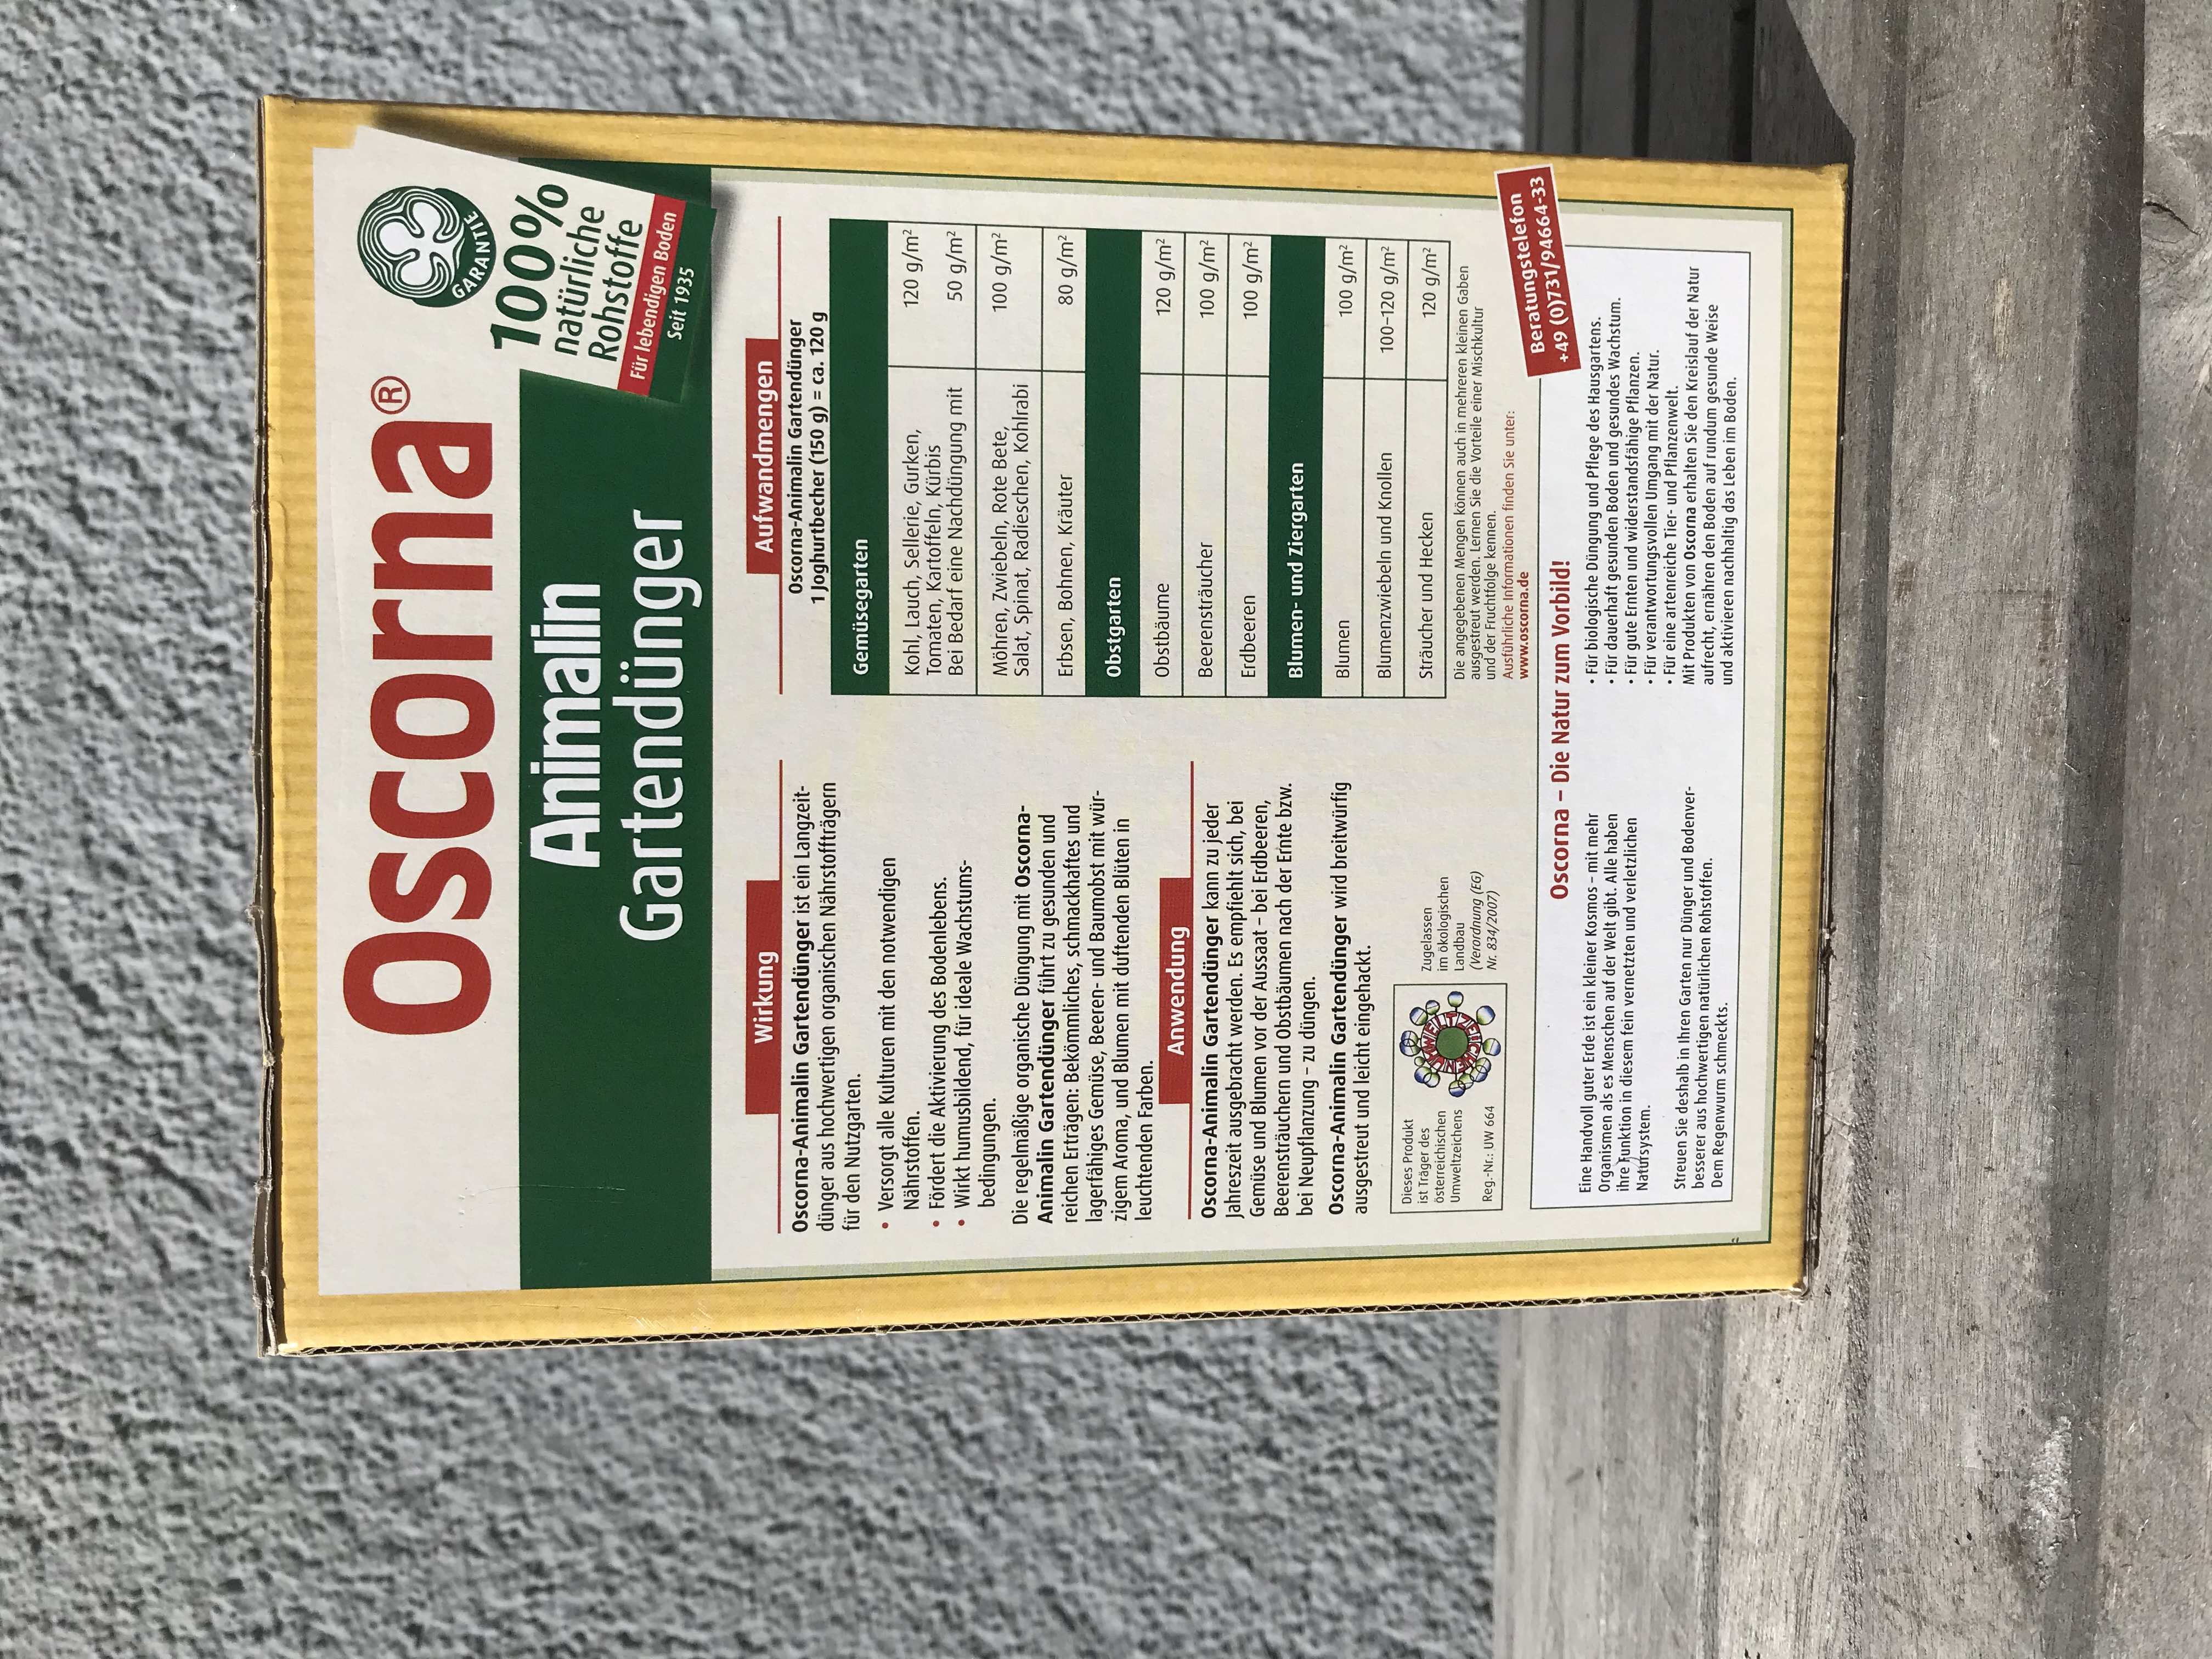 Oscorna Animalin Dünger